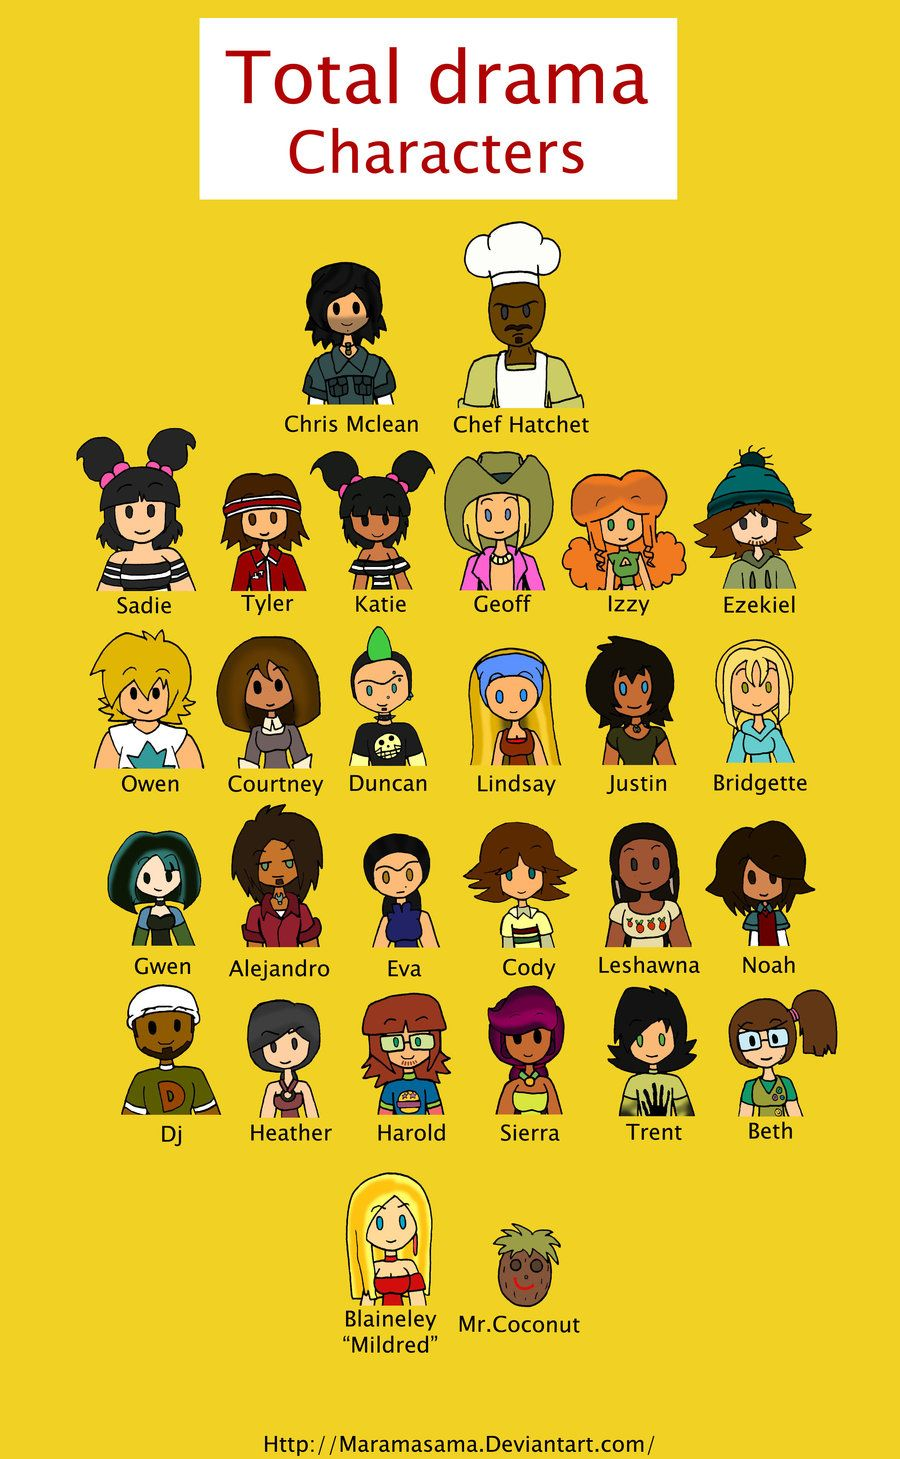 Total drama characters by Maramasama on DeviantArt